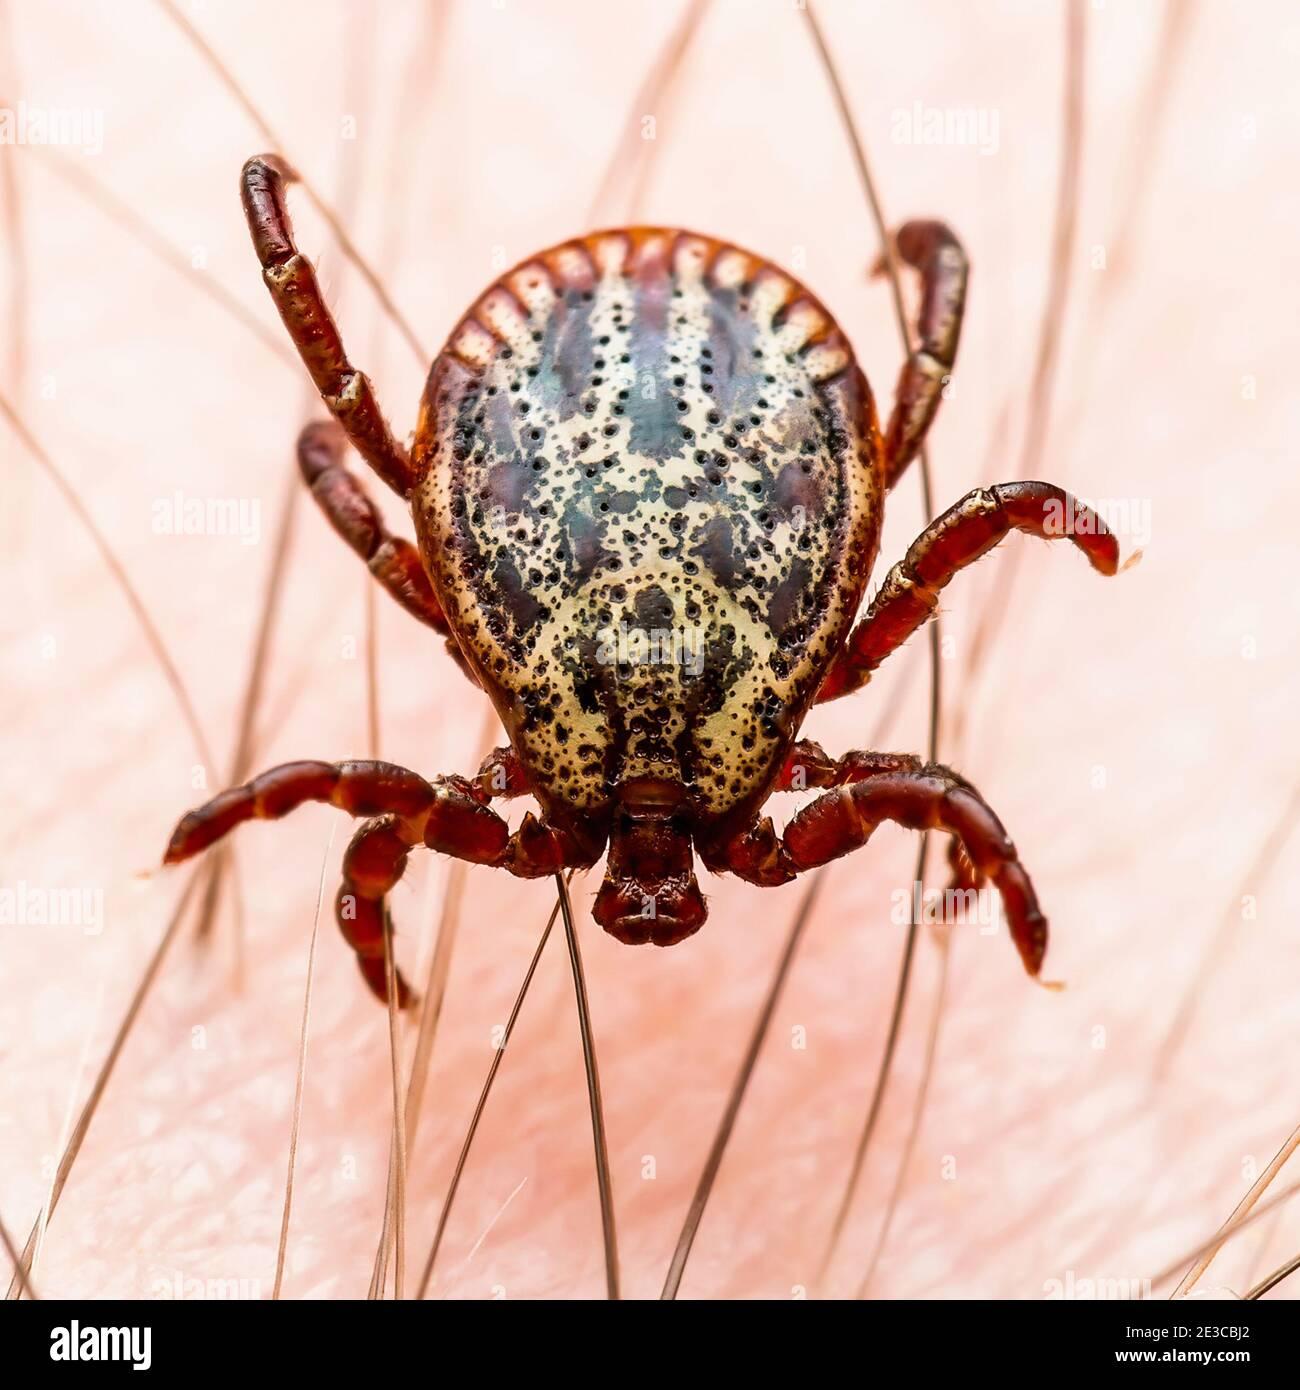 Encefalitis infecciosa garrapata insecto en la piel. Encefalitis virus o enfermedad de Lyme Borreliosis Dermacentor infectado parásito de garrapata Arachnid Macro. Foto de stock